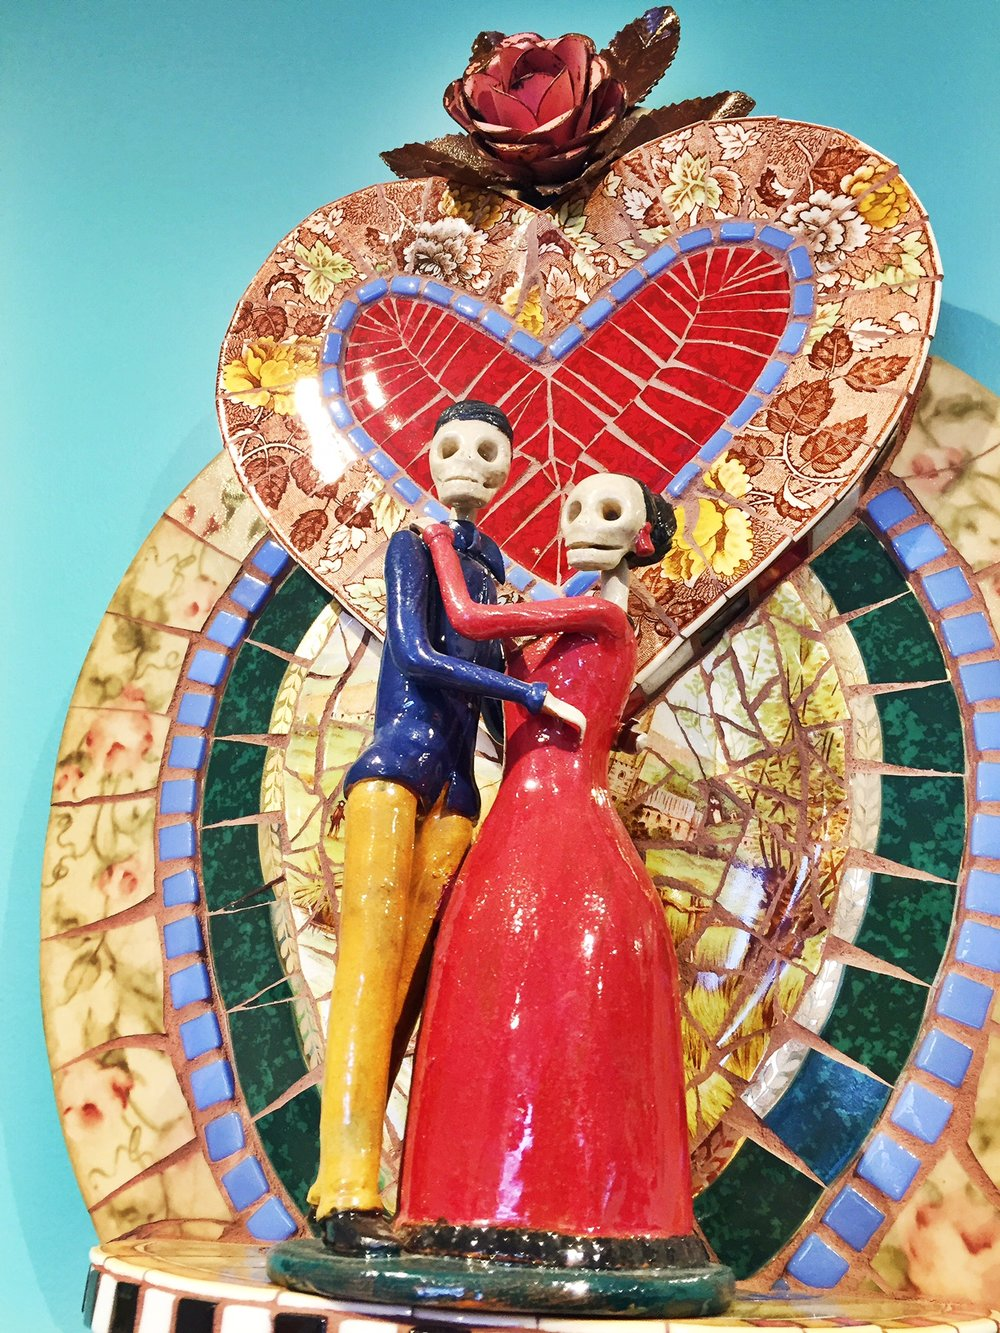 Valentine's Day themed Mosaic